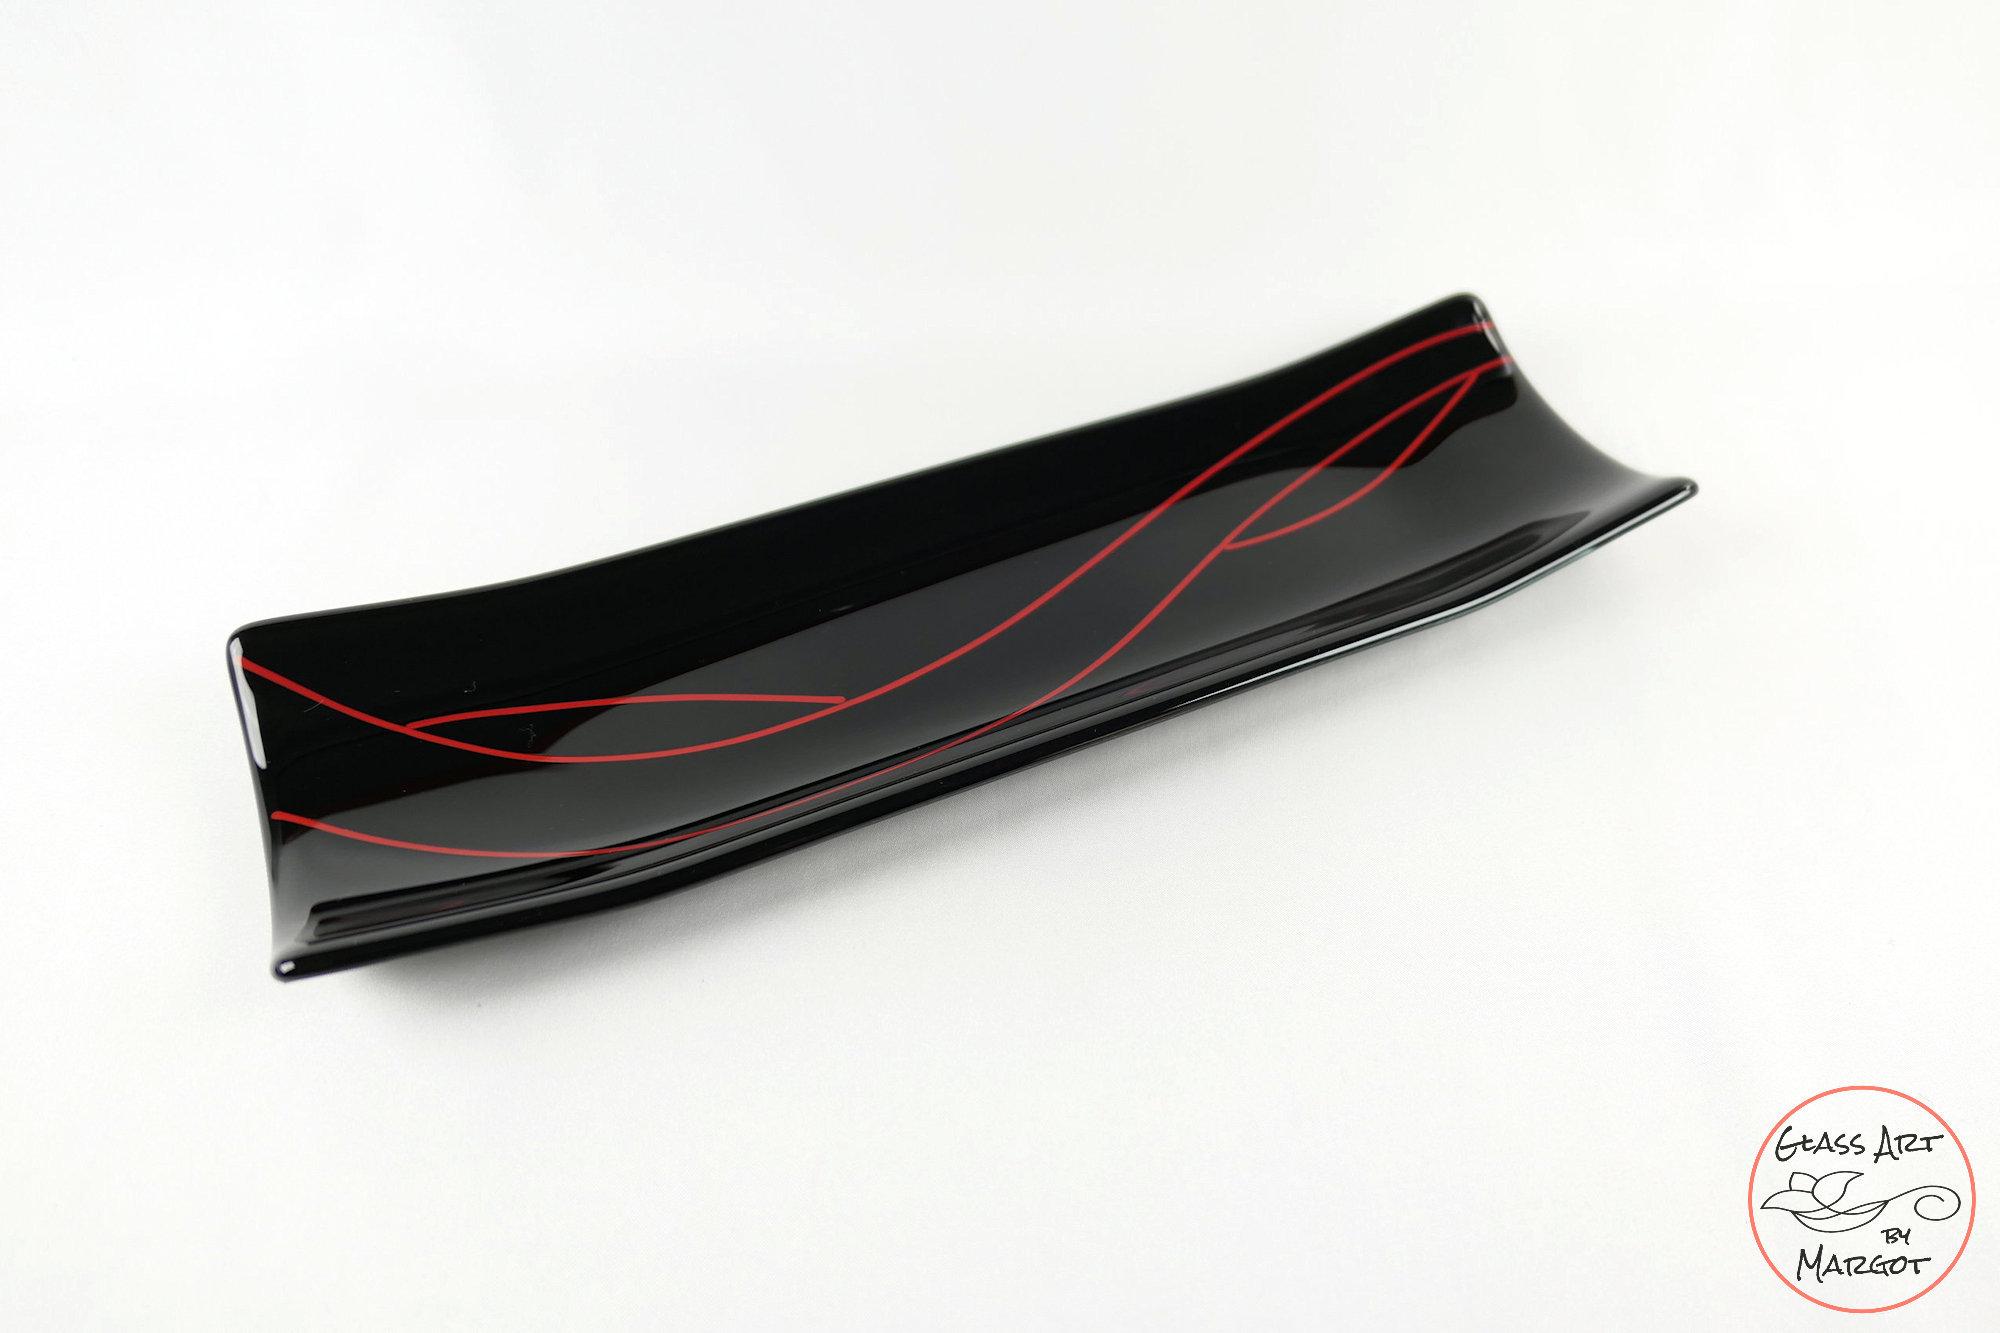 Christmas Red Stringer Black Fused Glass Channel Plate Rectangular Serving Tray Platter Glass Art By Margot